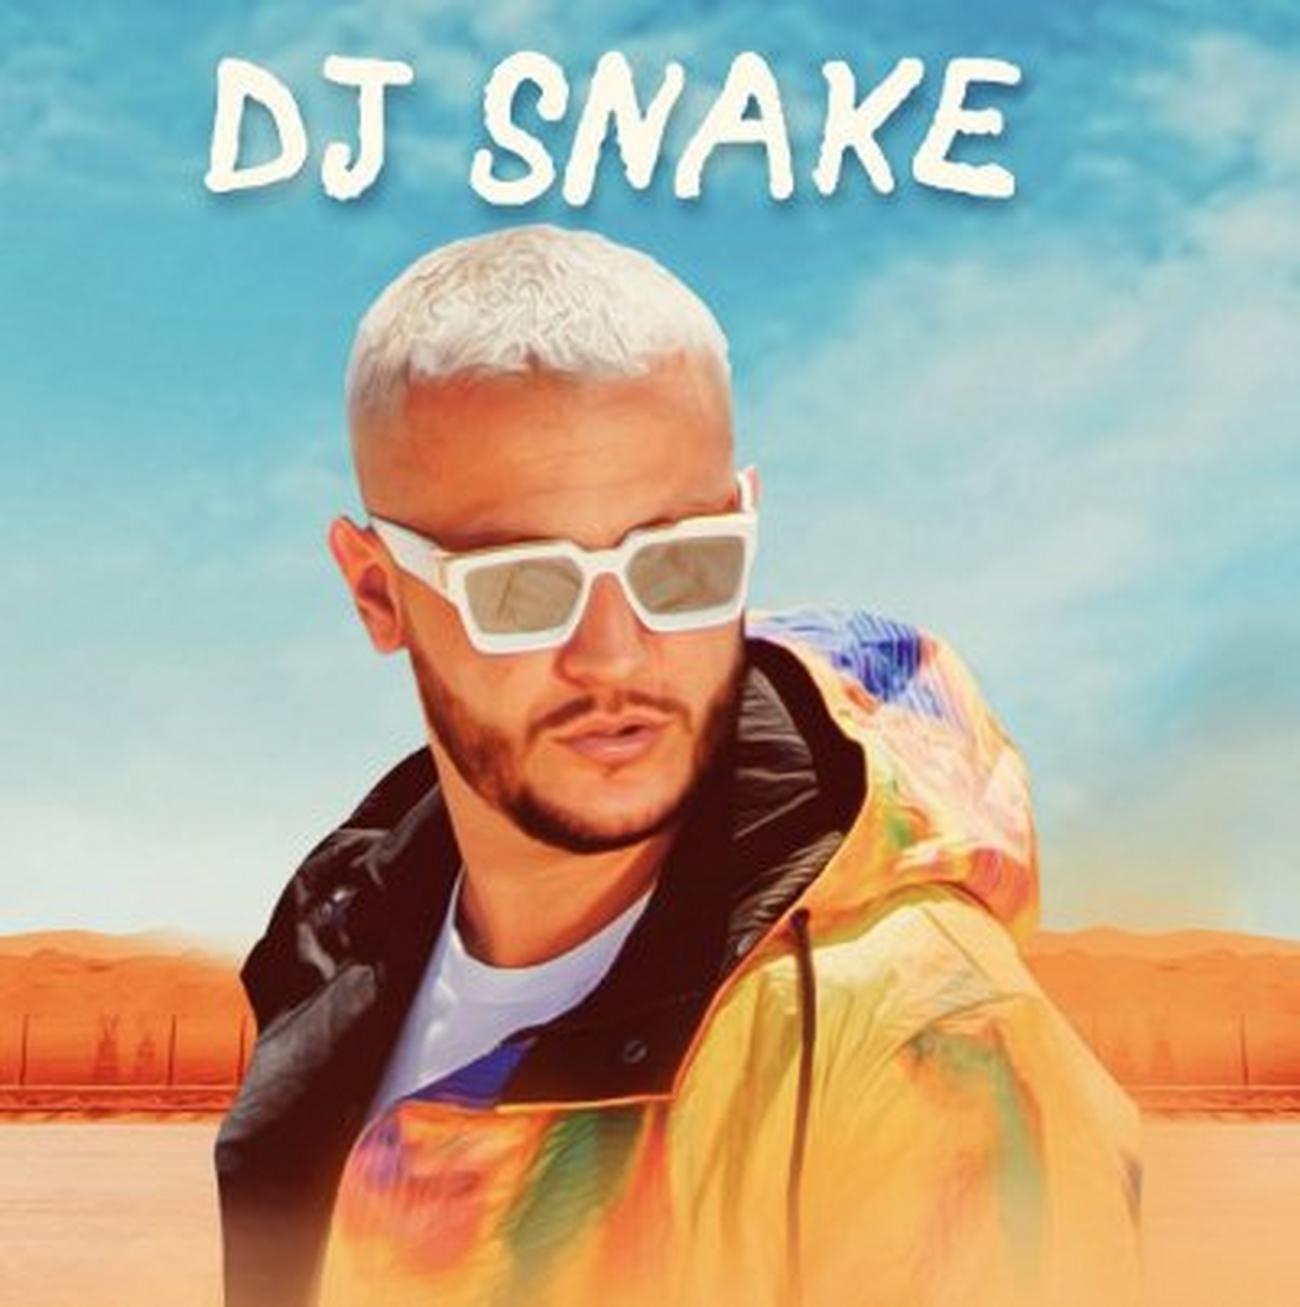 DJ SNAKE to Play at Cavo Paradiso